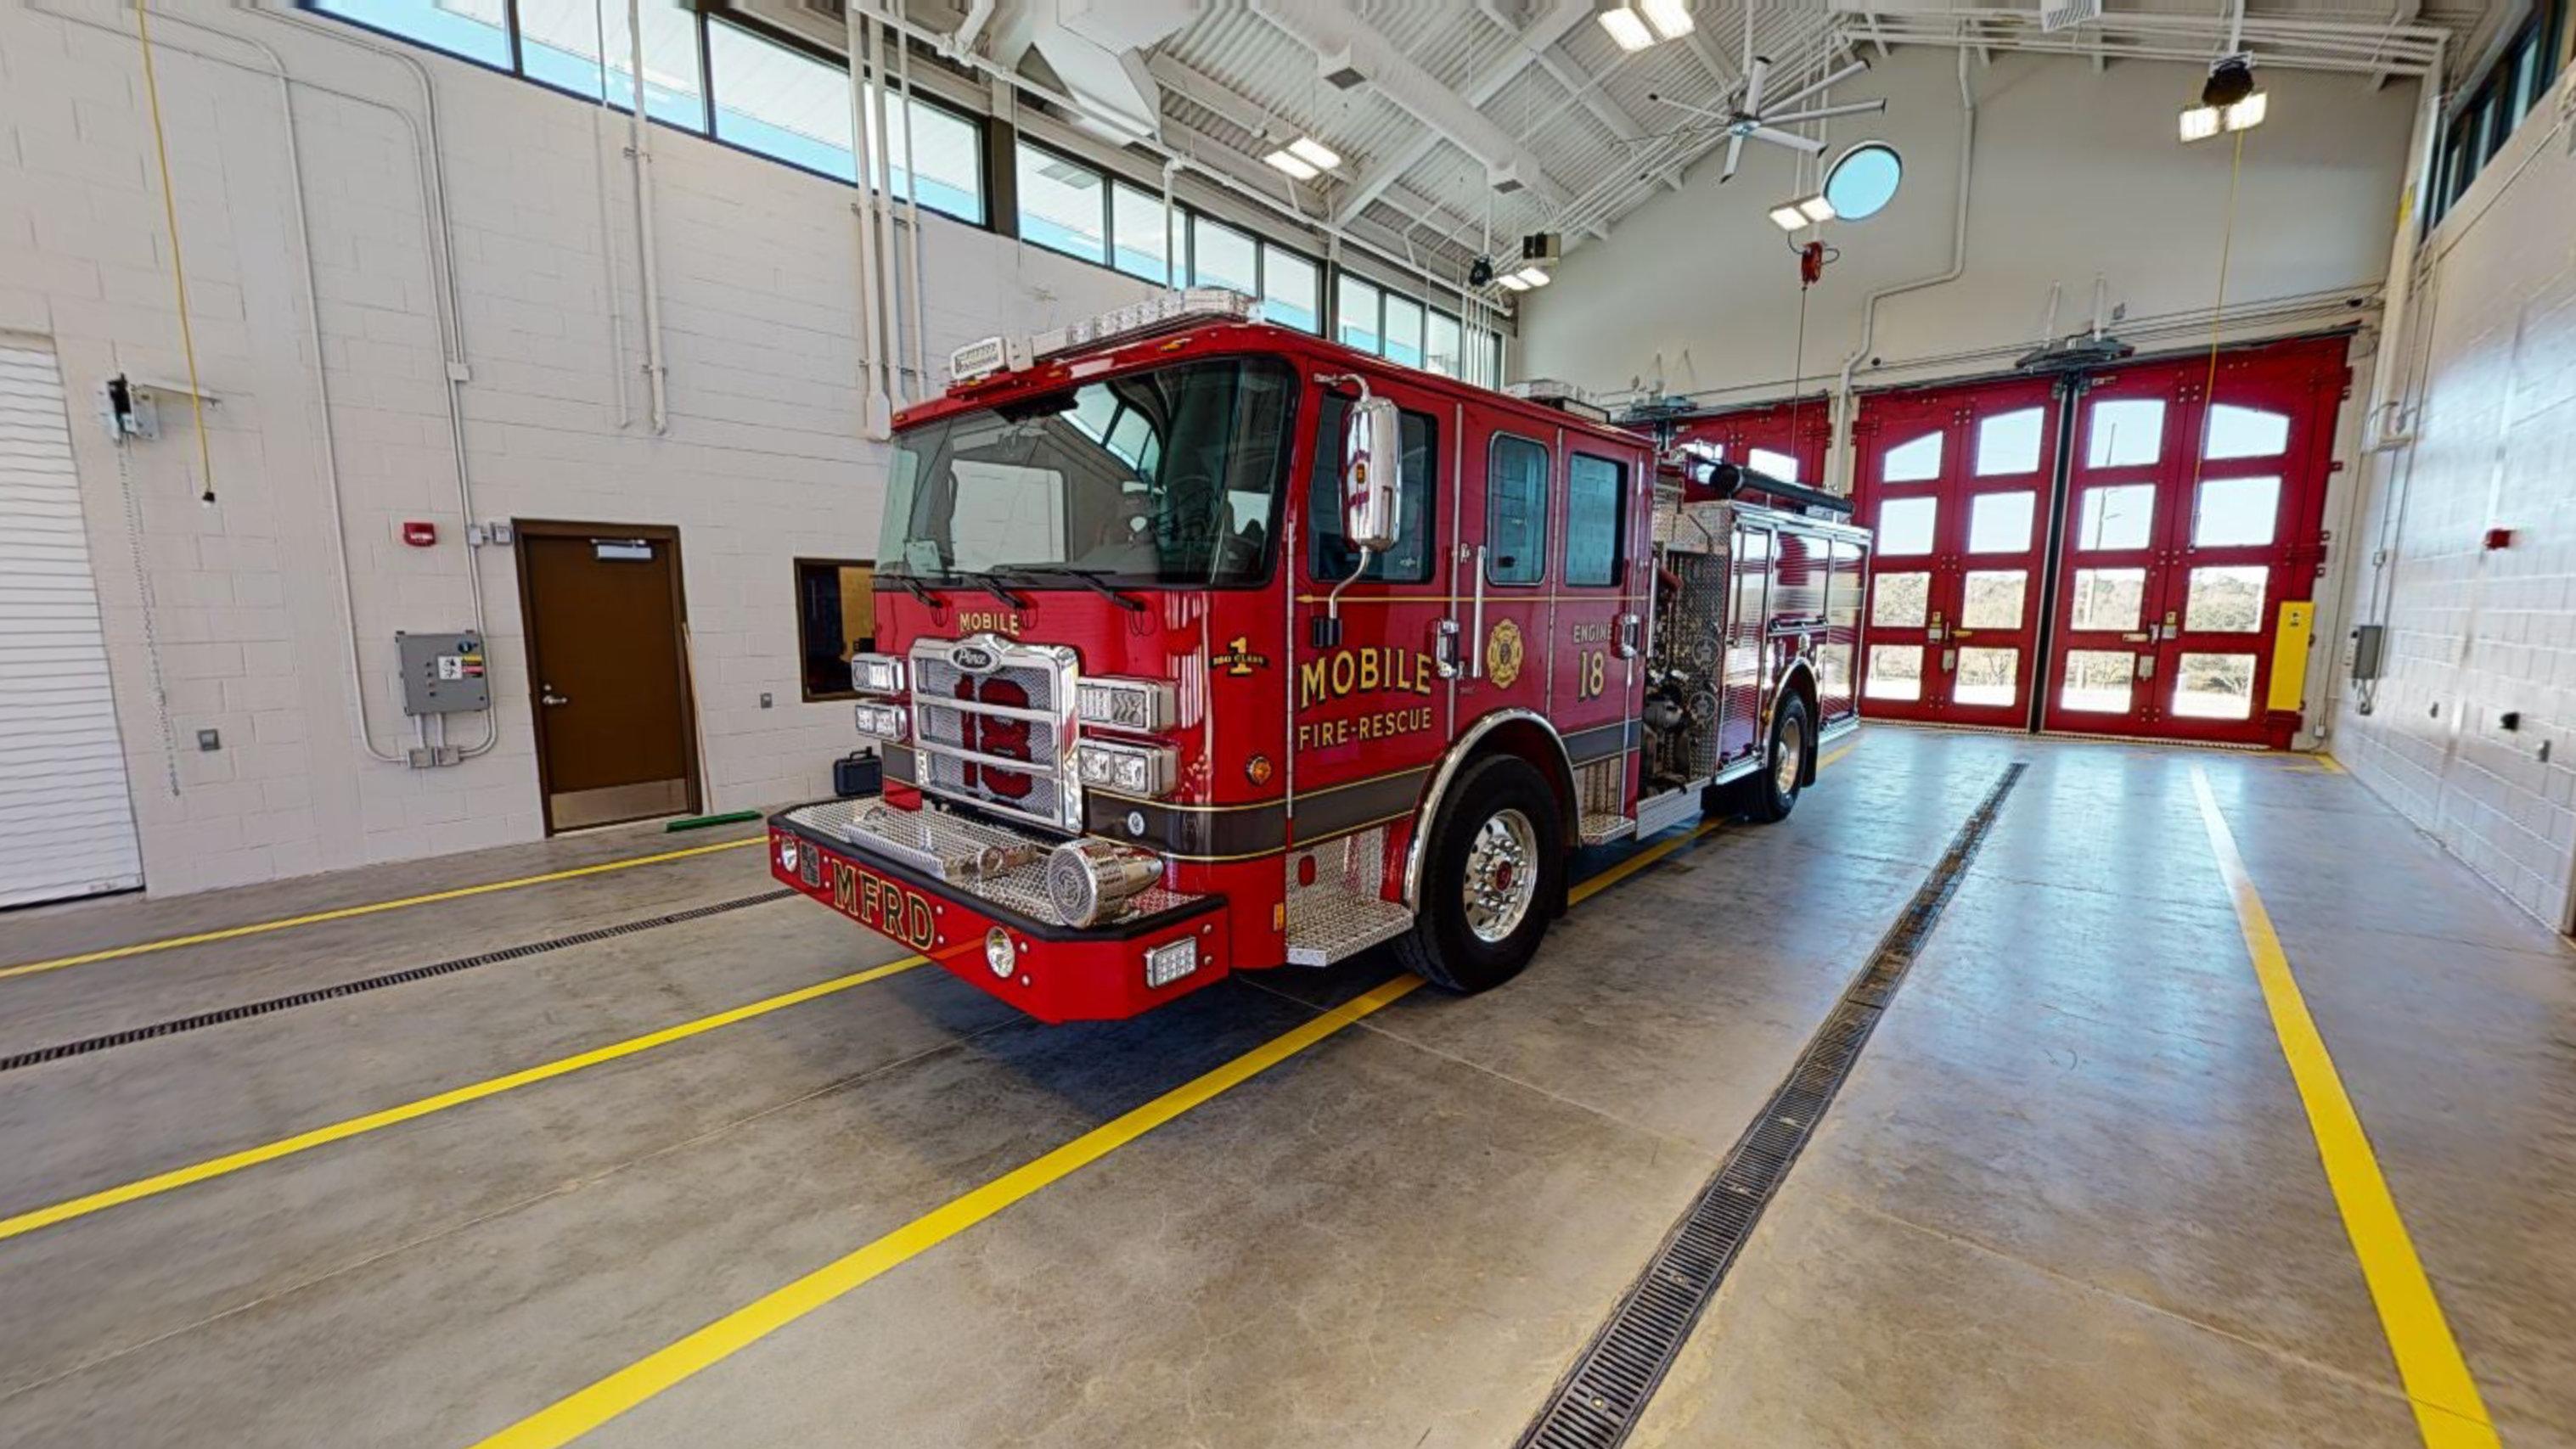 Mobile-Fire-Rescue-Engine-18-01152021_140550